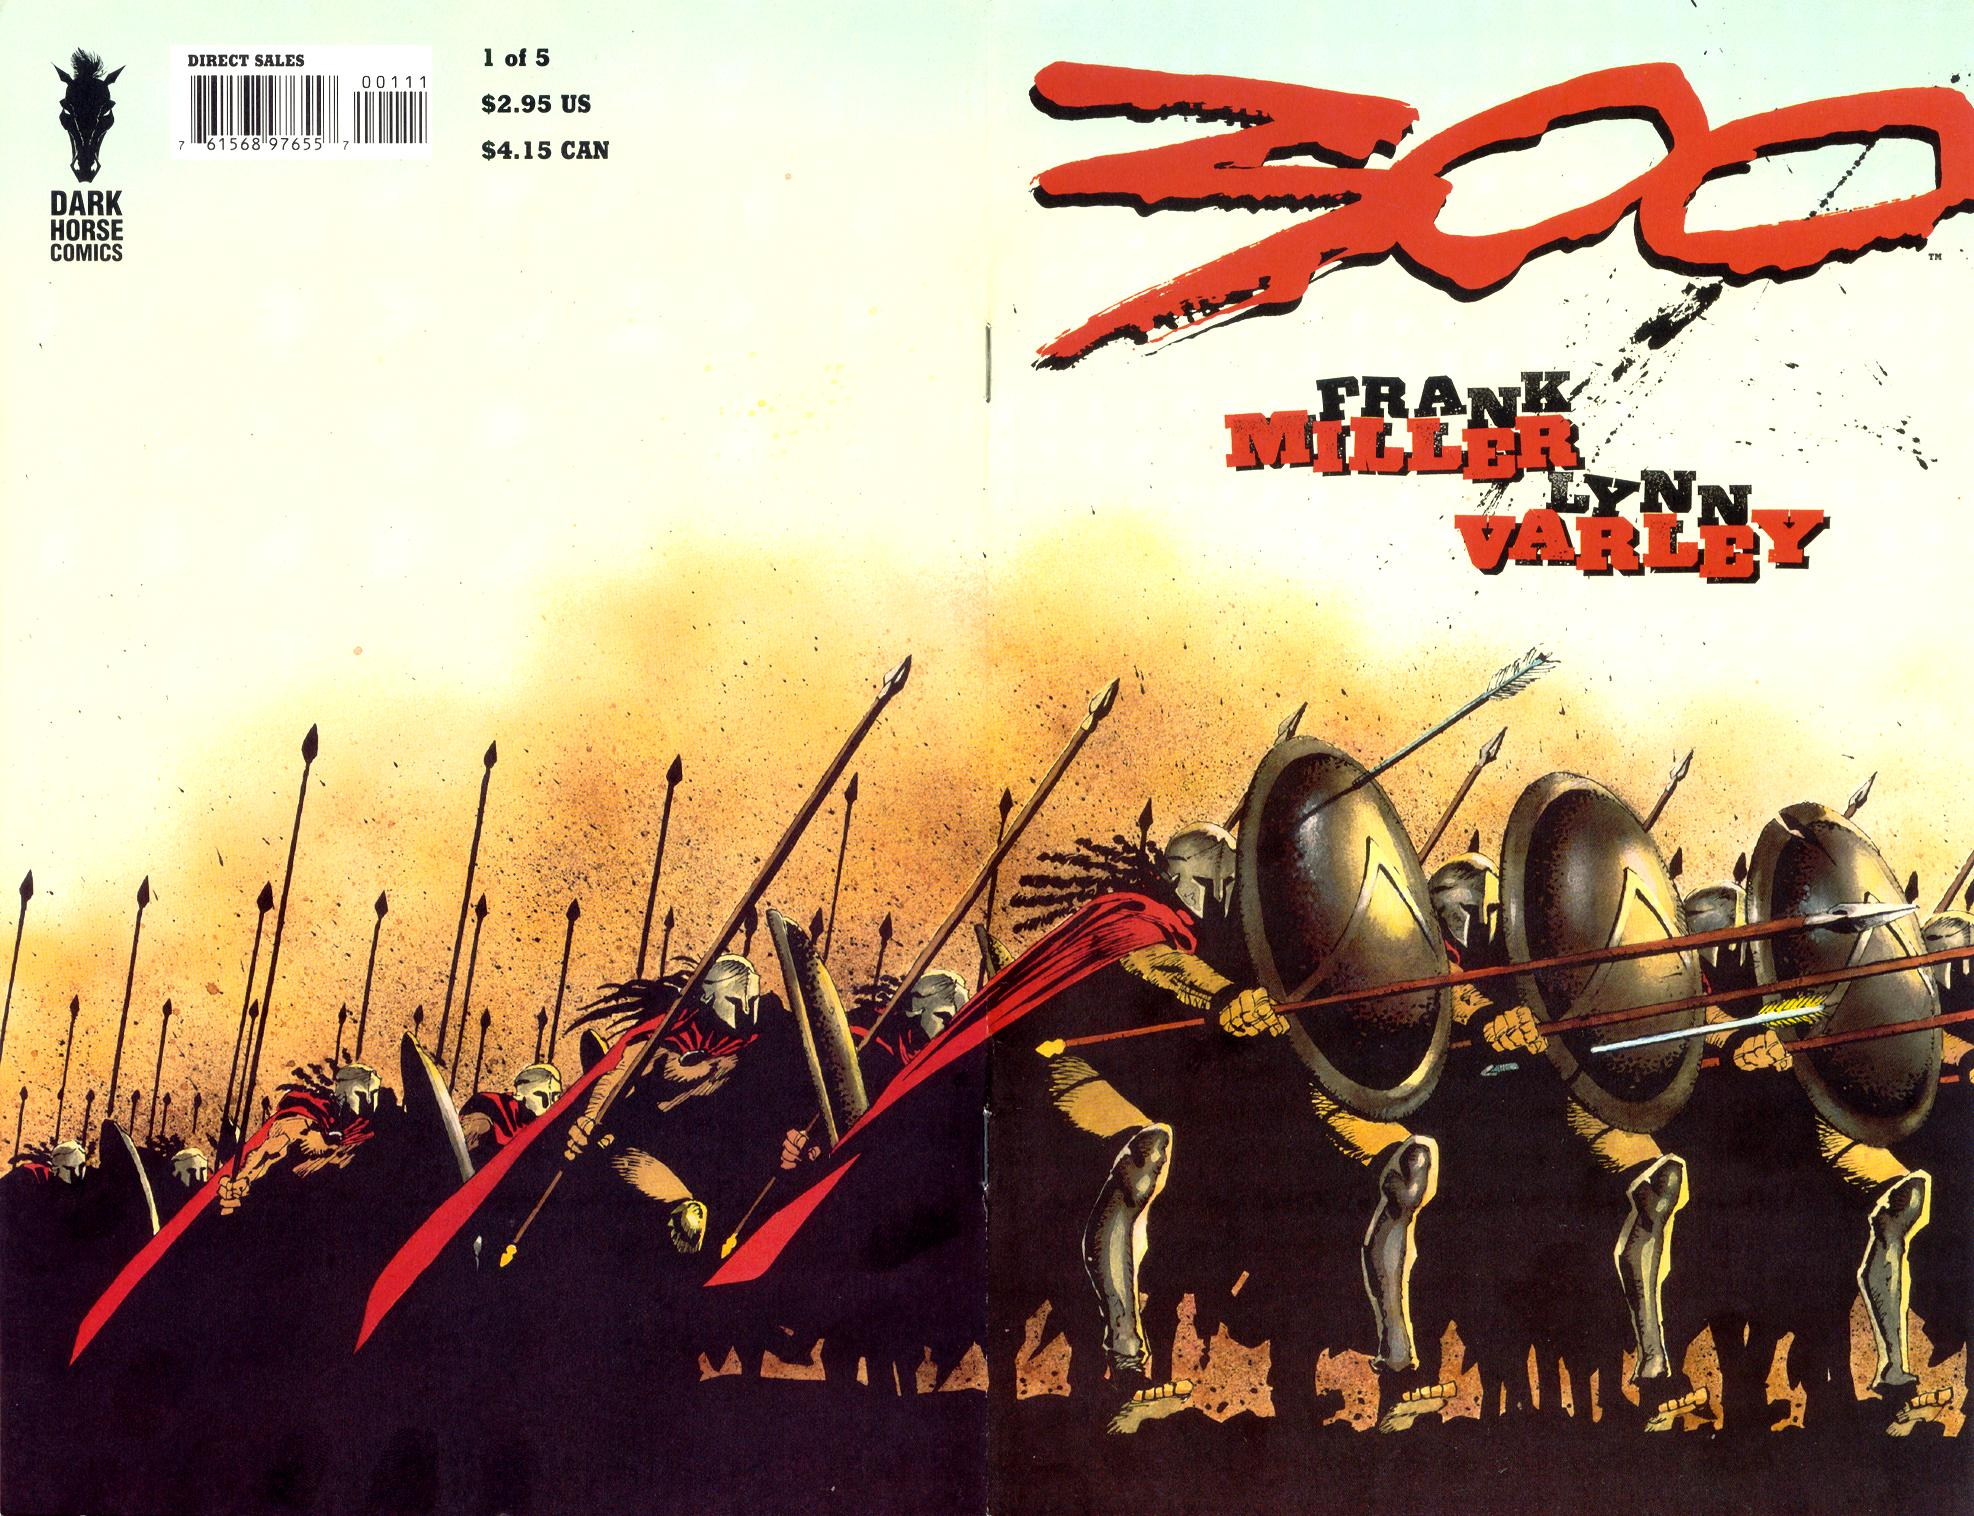 Spartan 300 Warrior]-Complete Download Free Vector,PSD,FLASH,JPG--www